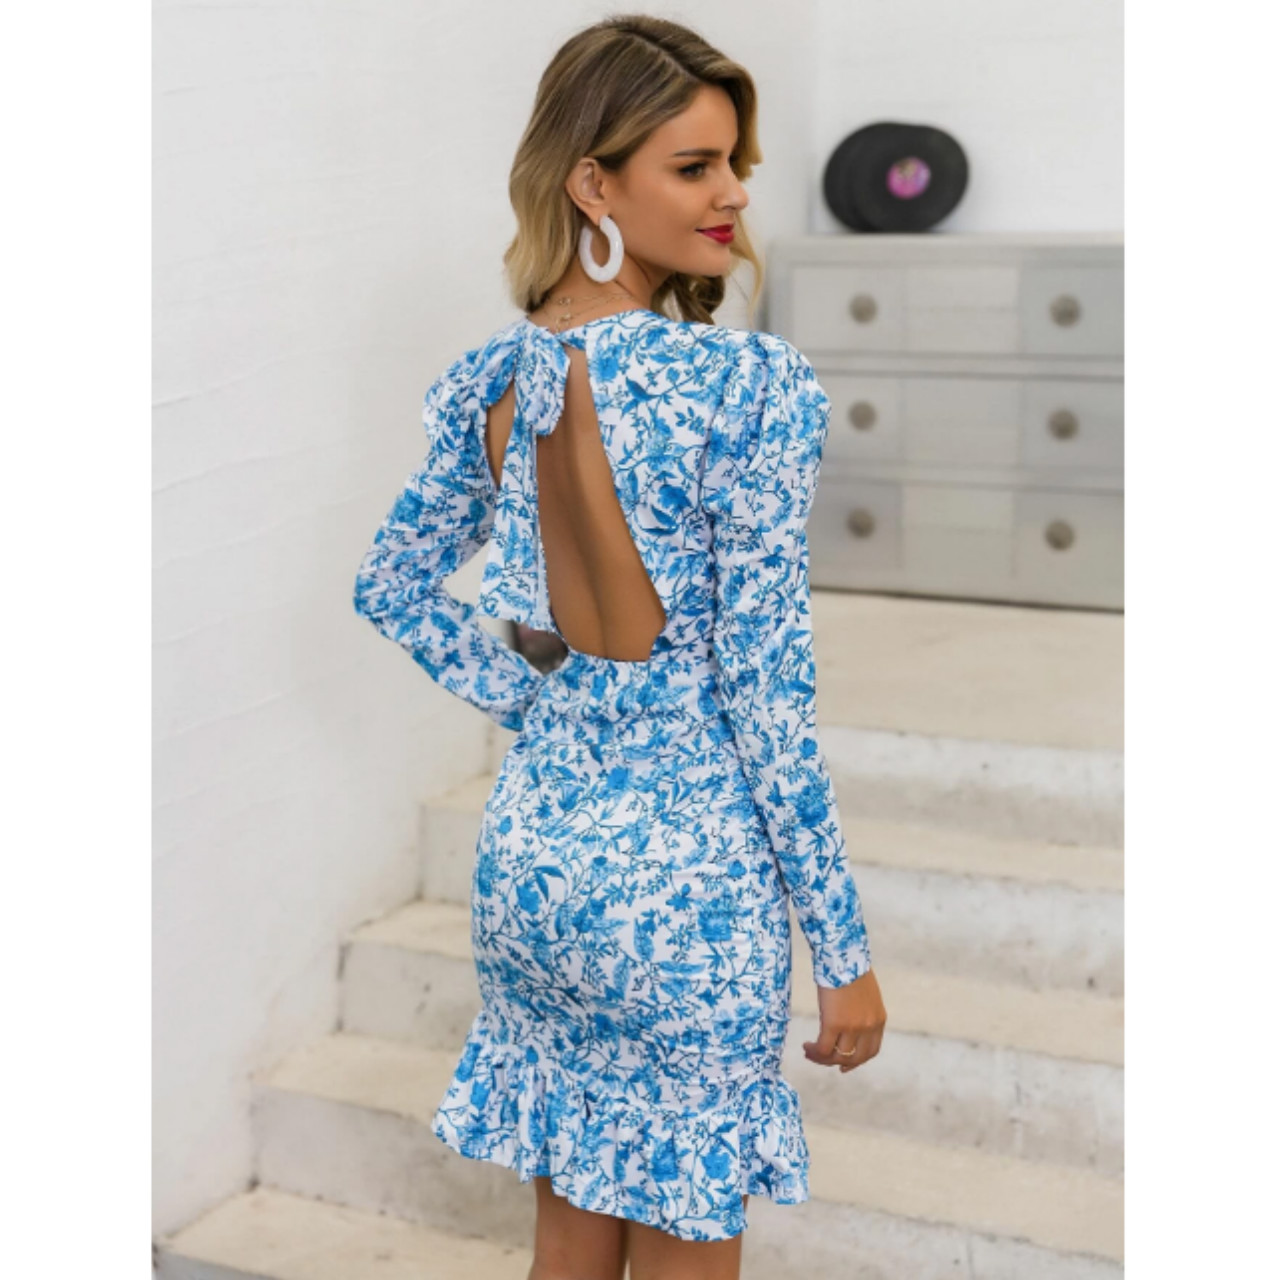 Glamaker floral ruffle dress s